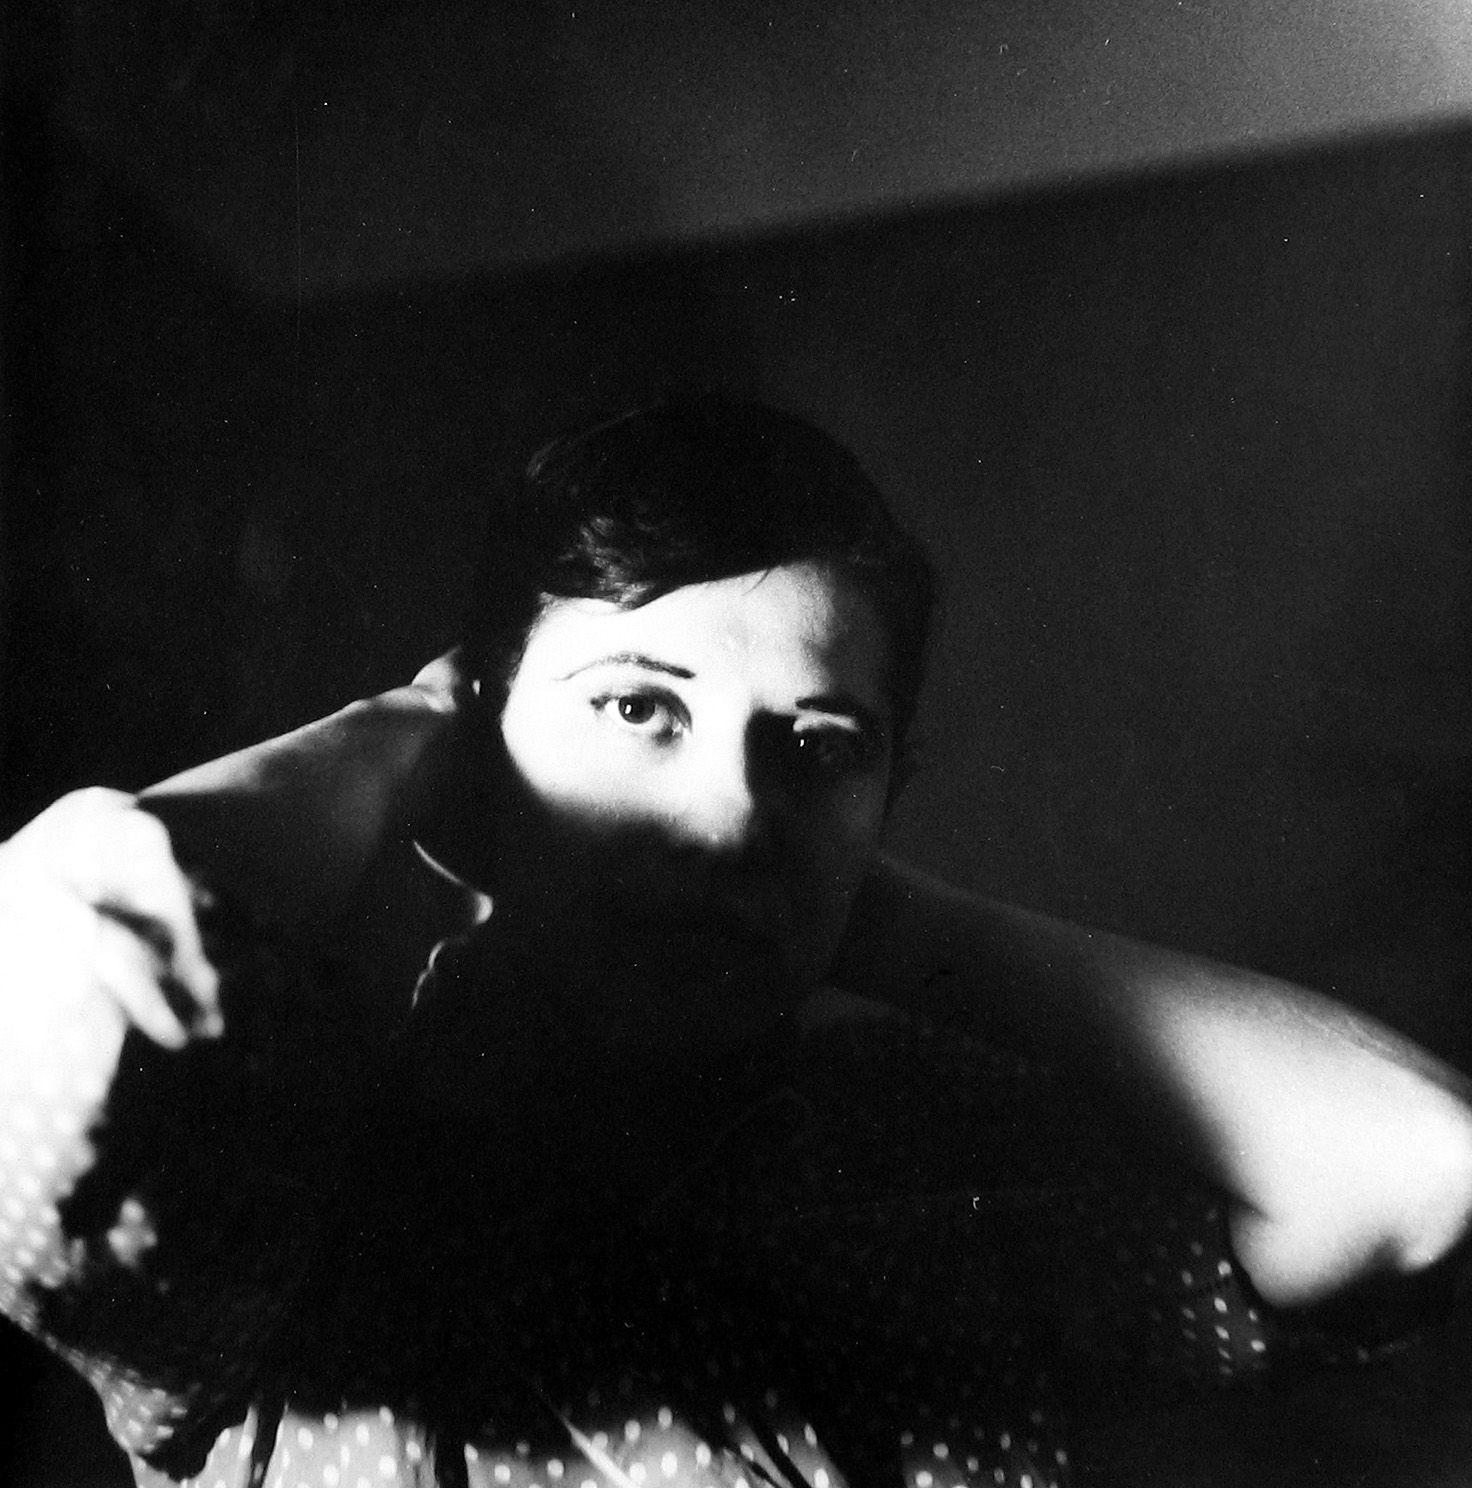 The Image Gallery: Redux 1959-1962 2014 Howard Greenberg Gallery